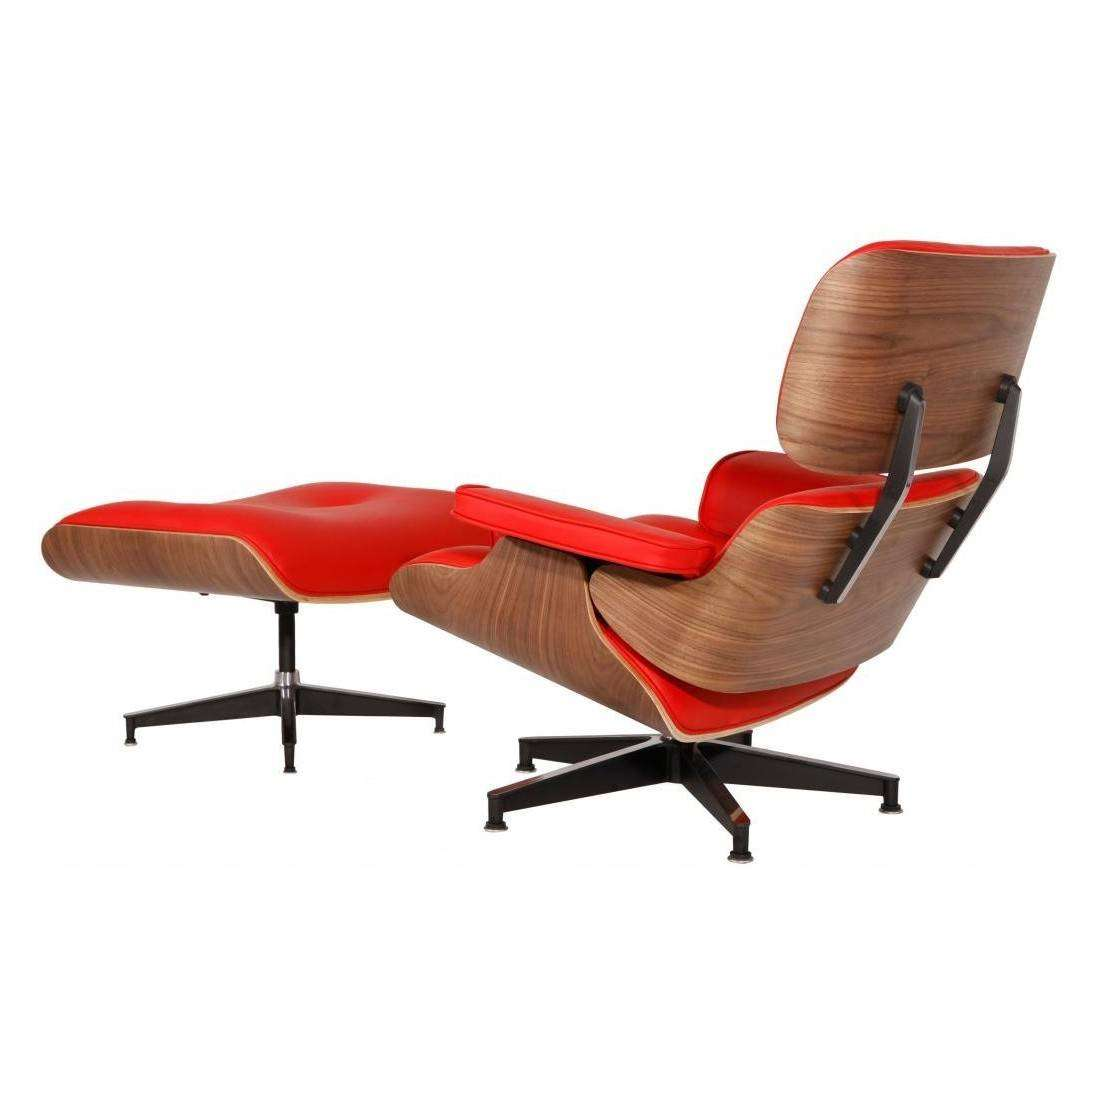 mod lounge chair ottoman red walnut